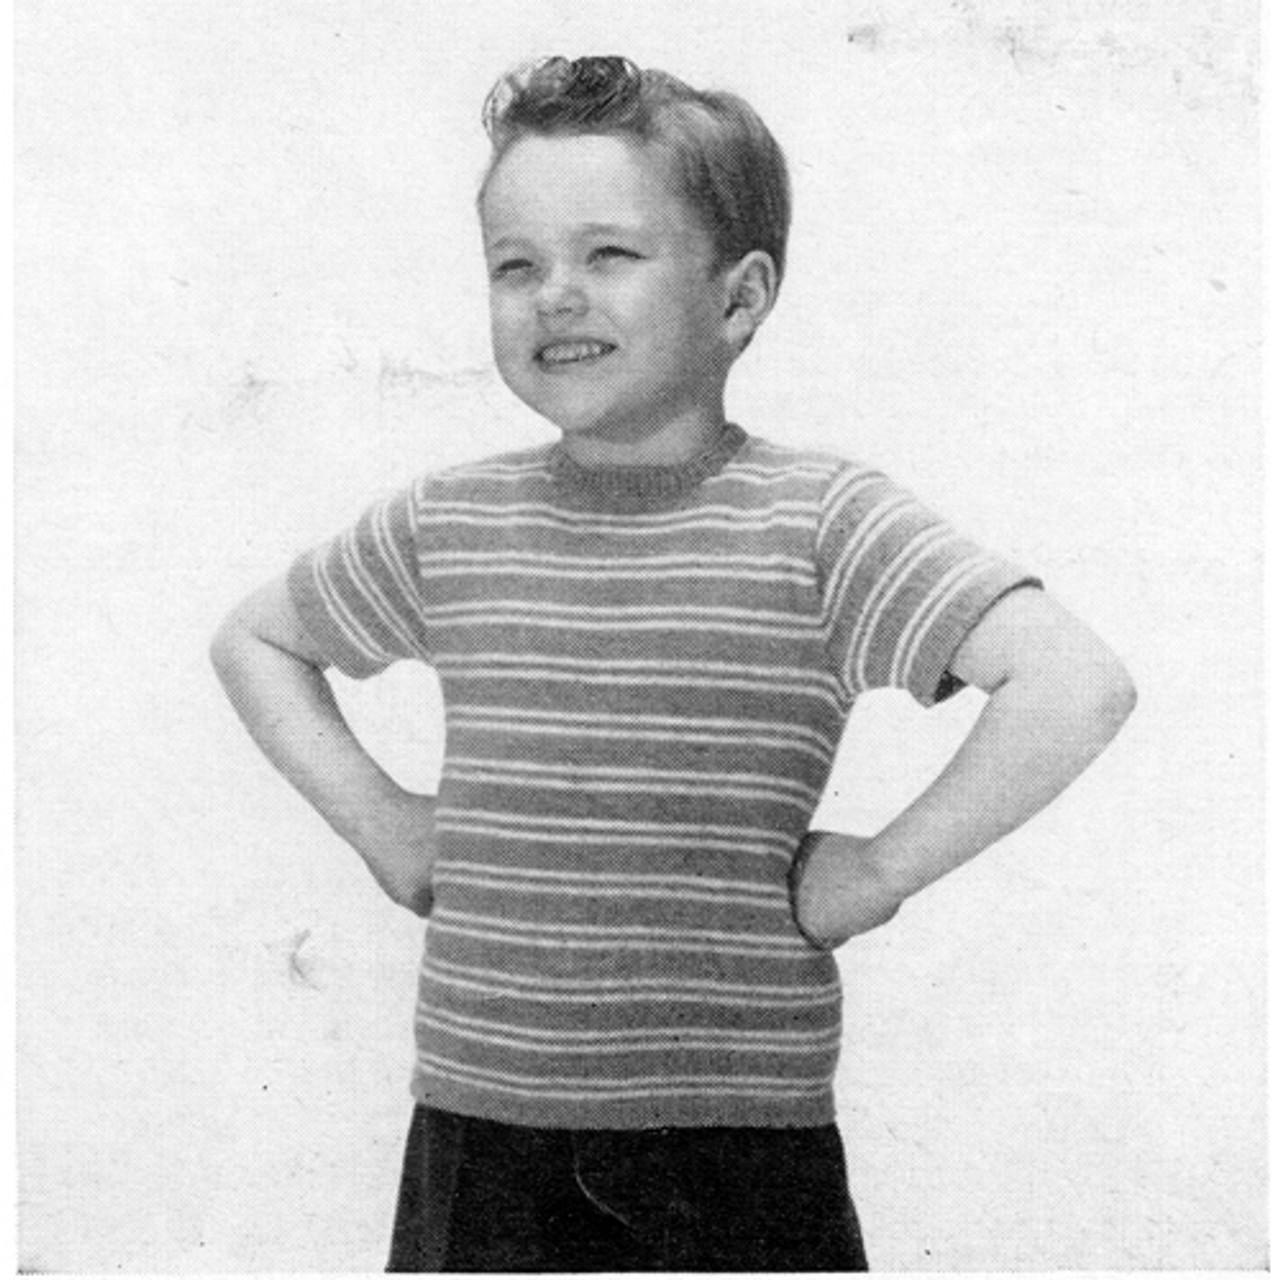 Kids Knitted Striped T-Shirt Pattern